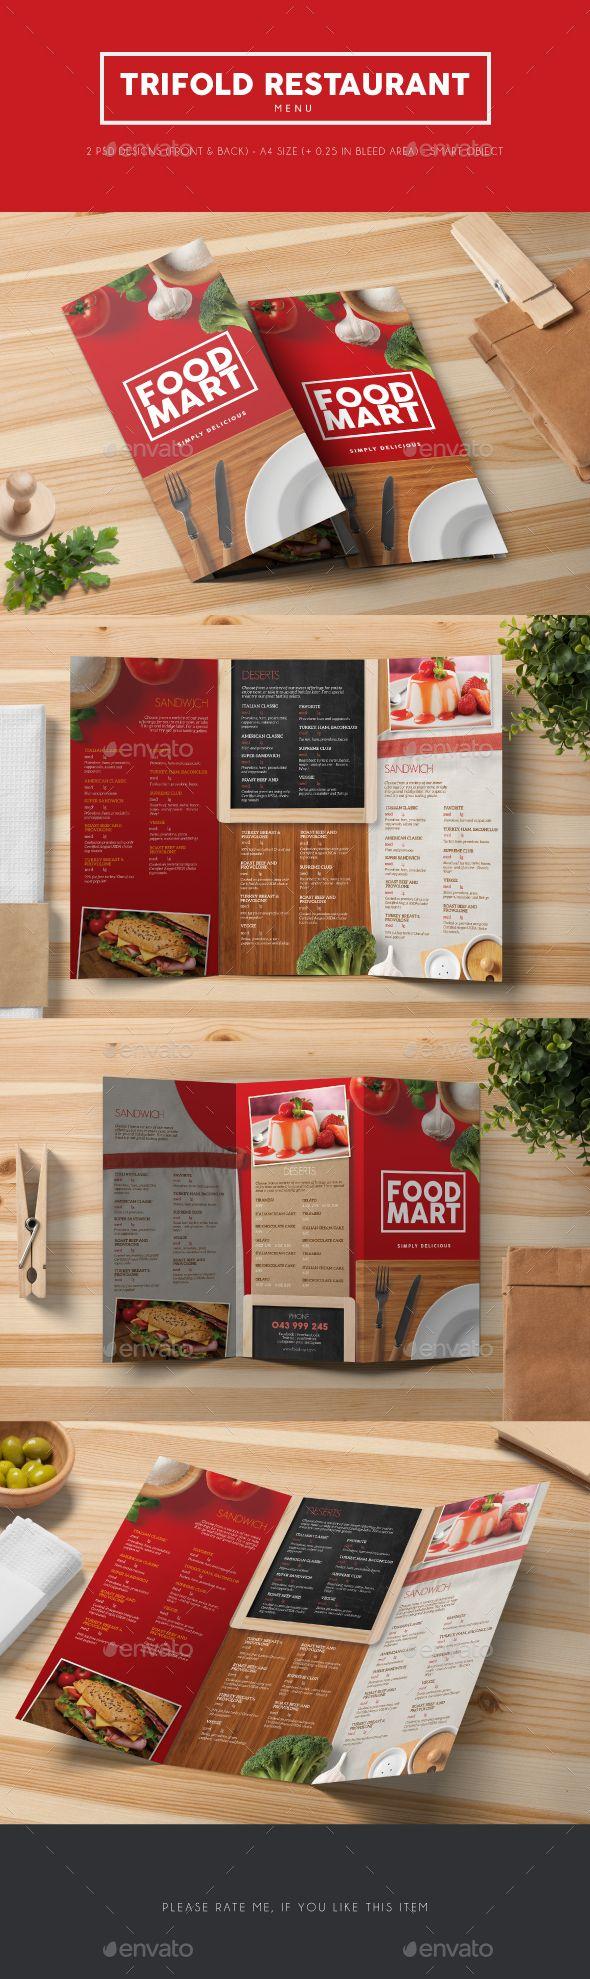 Trifold Restaurant Menu  Restaurant Menu Template Menu Templates